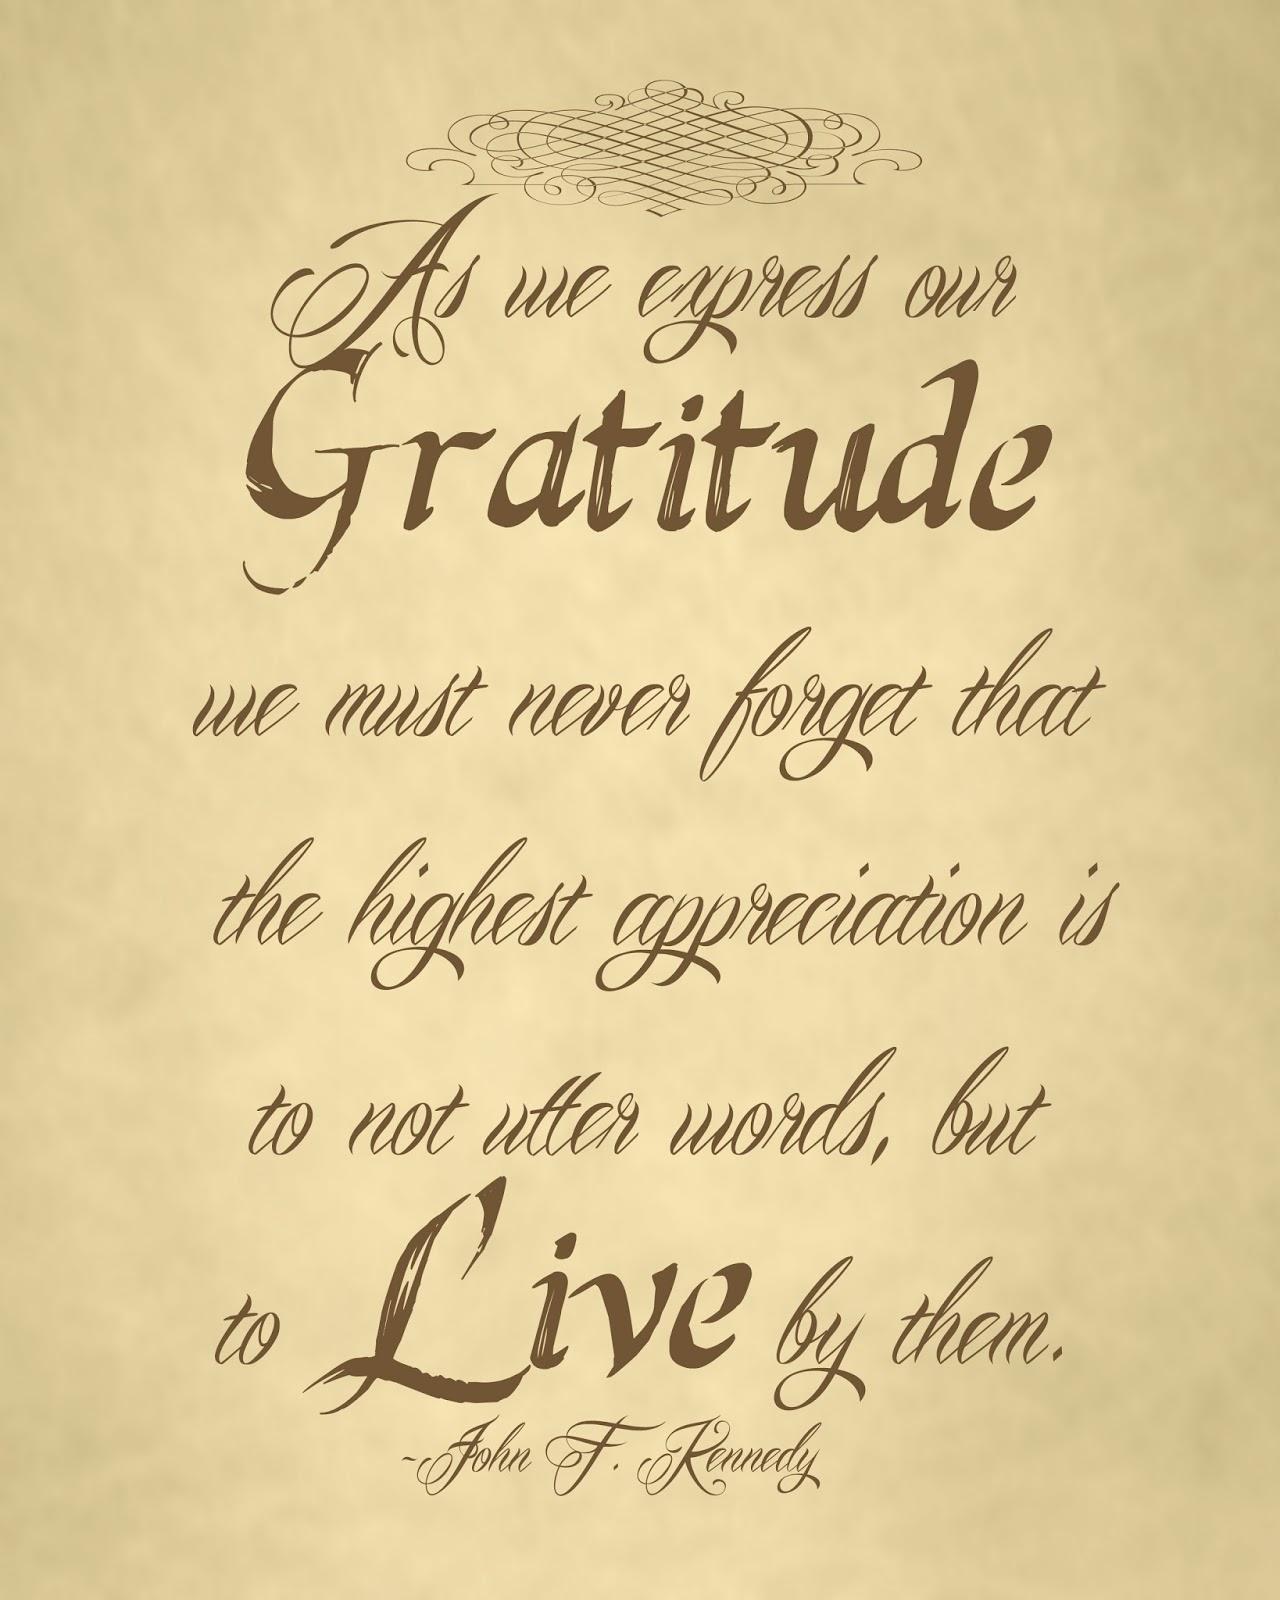 John F Kennedy Gratitude Quote: Autumn-Bennett: Gratitude Print 8x10